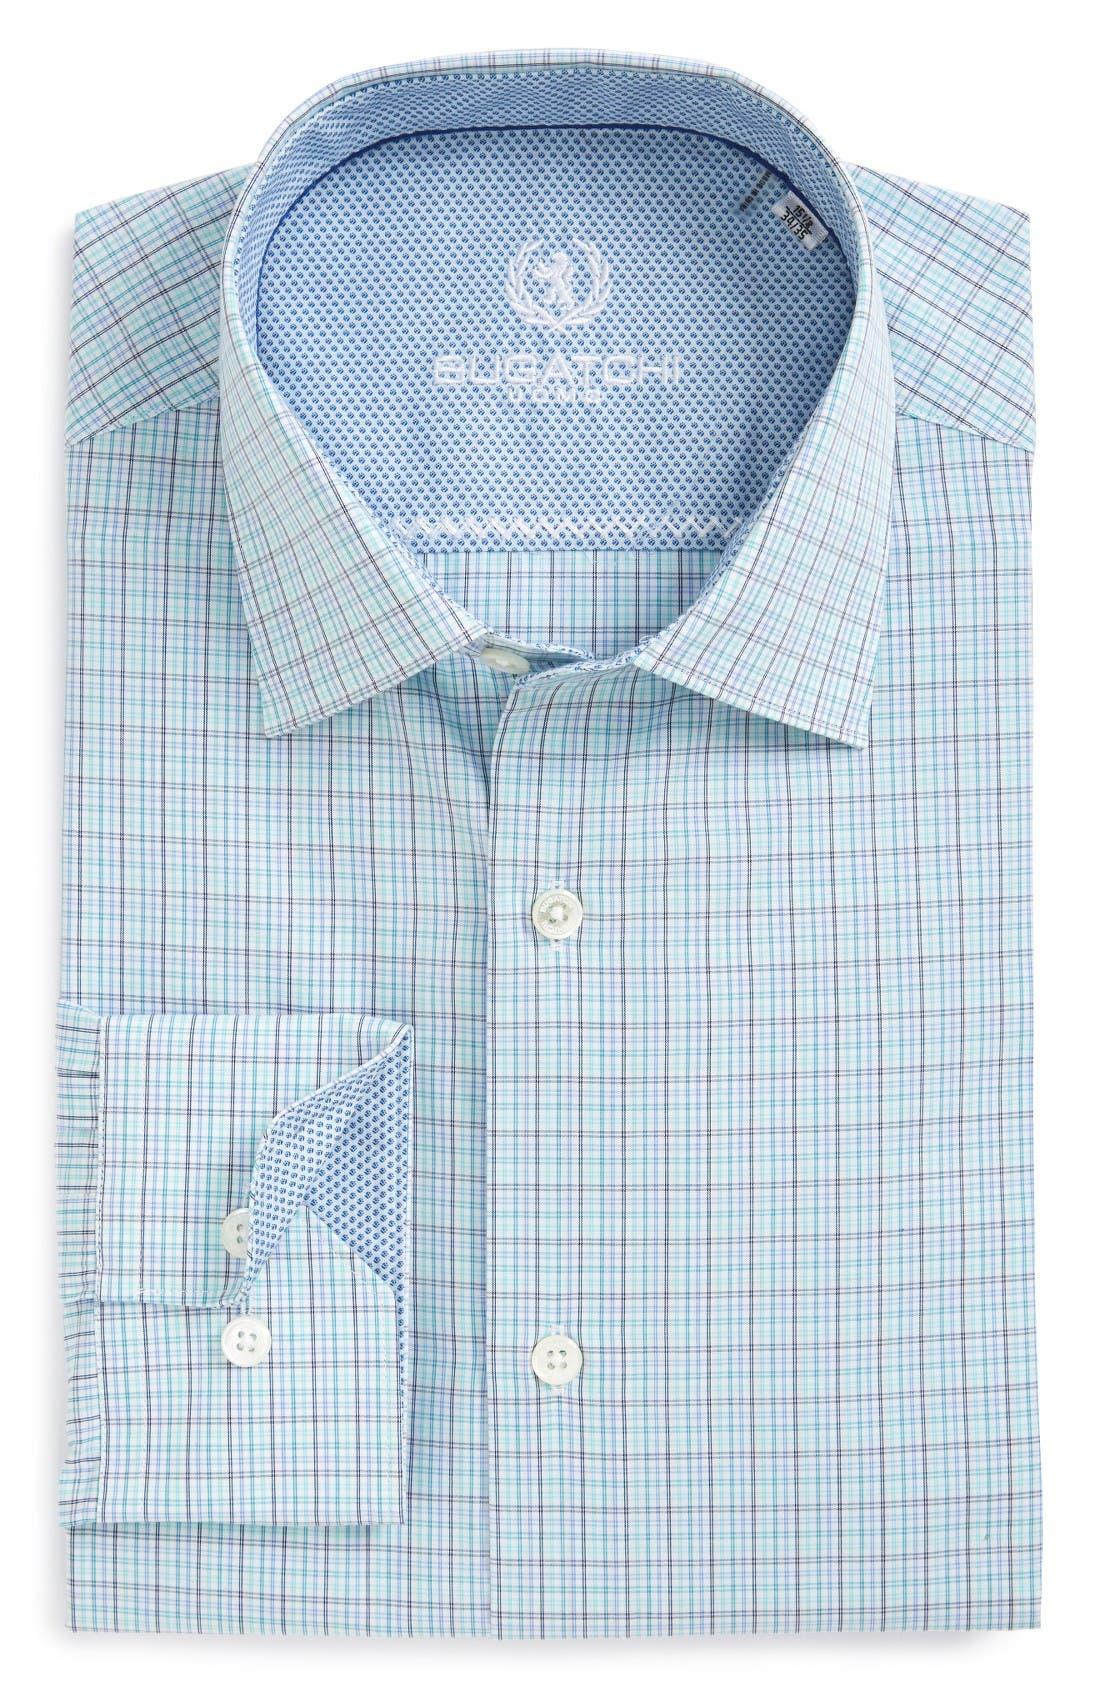 Main Image - Bugatchi Trim Fit Check Dress Shirt